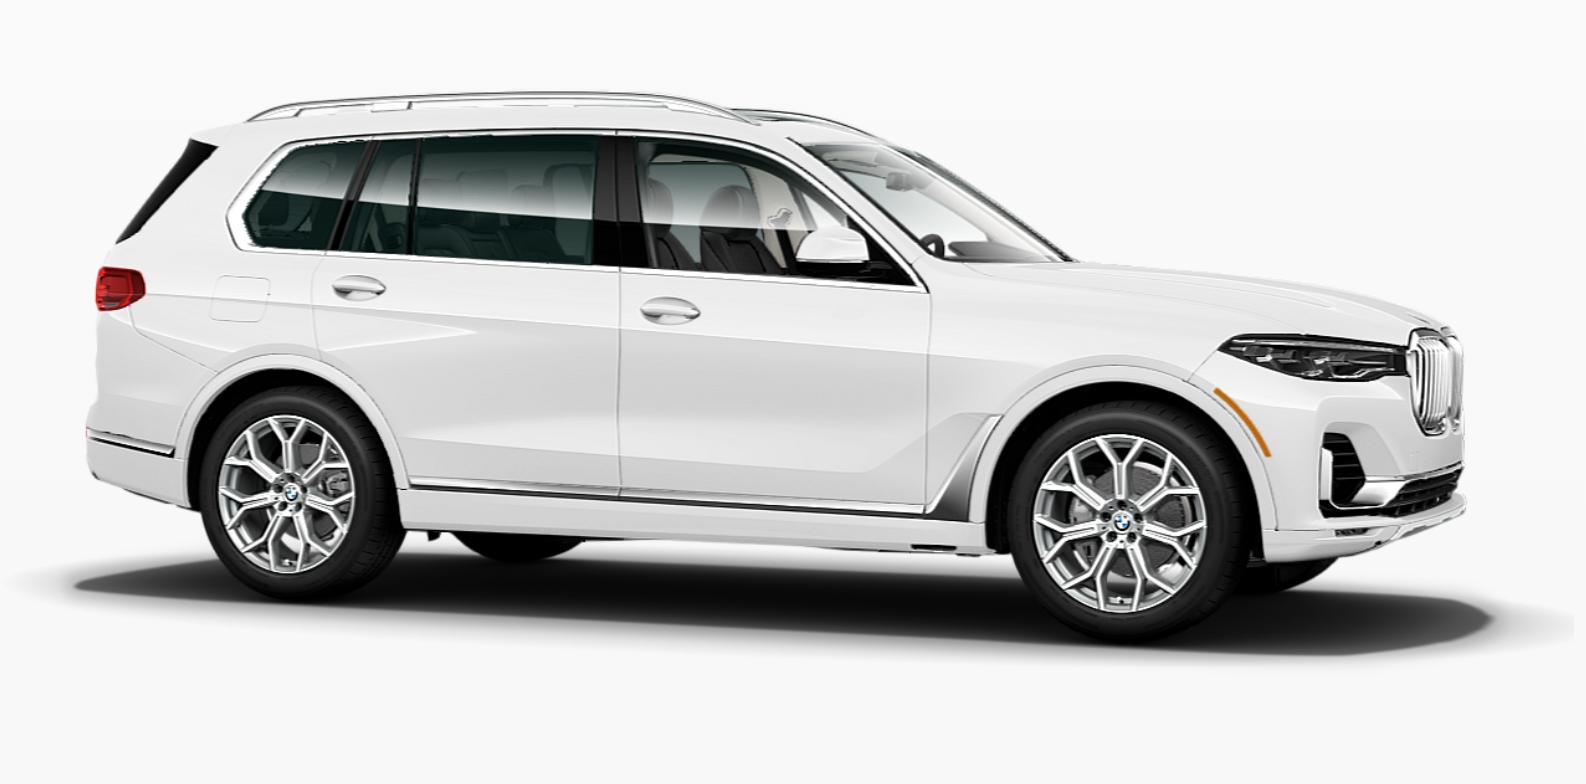 X7 xDrive40i Sedan Model Information | BMW of Minnetonka